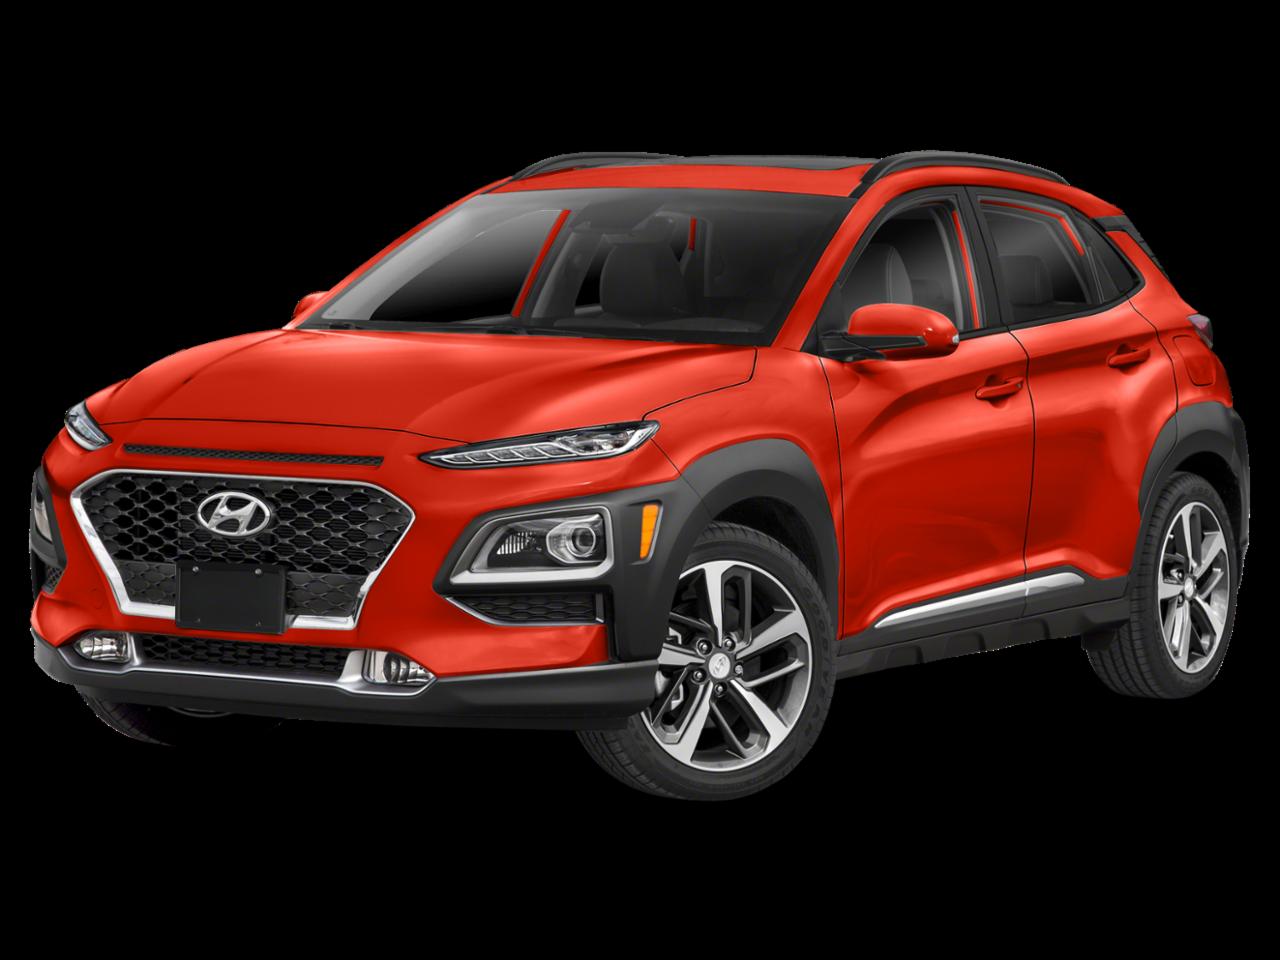 Hyundai 2020 Kona Limited